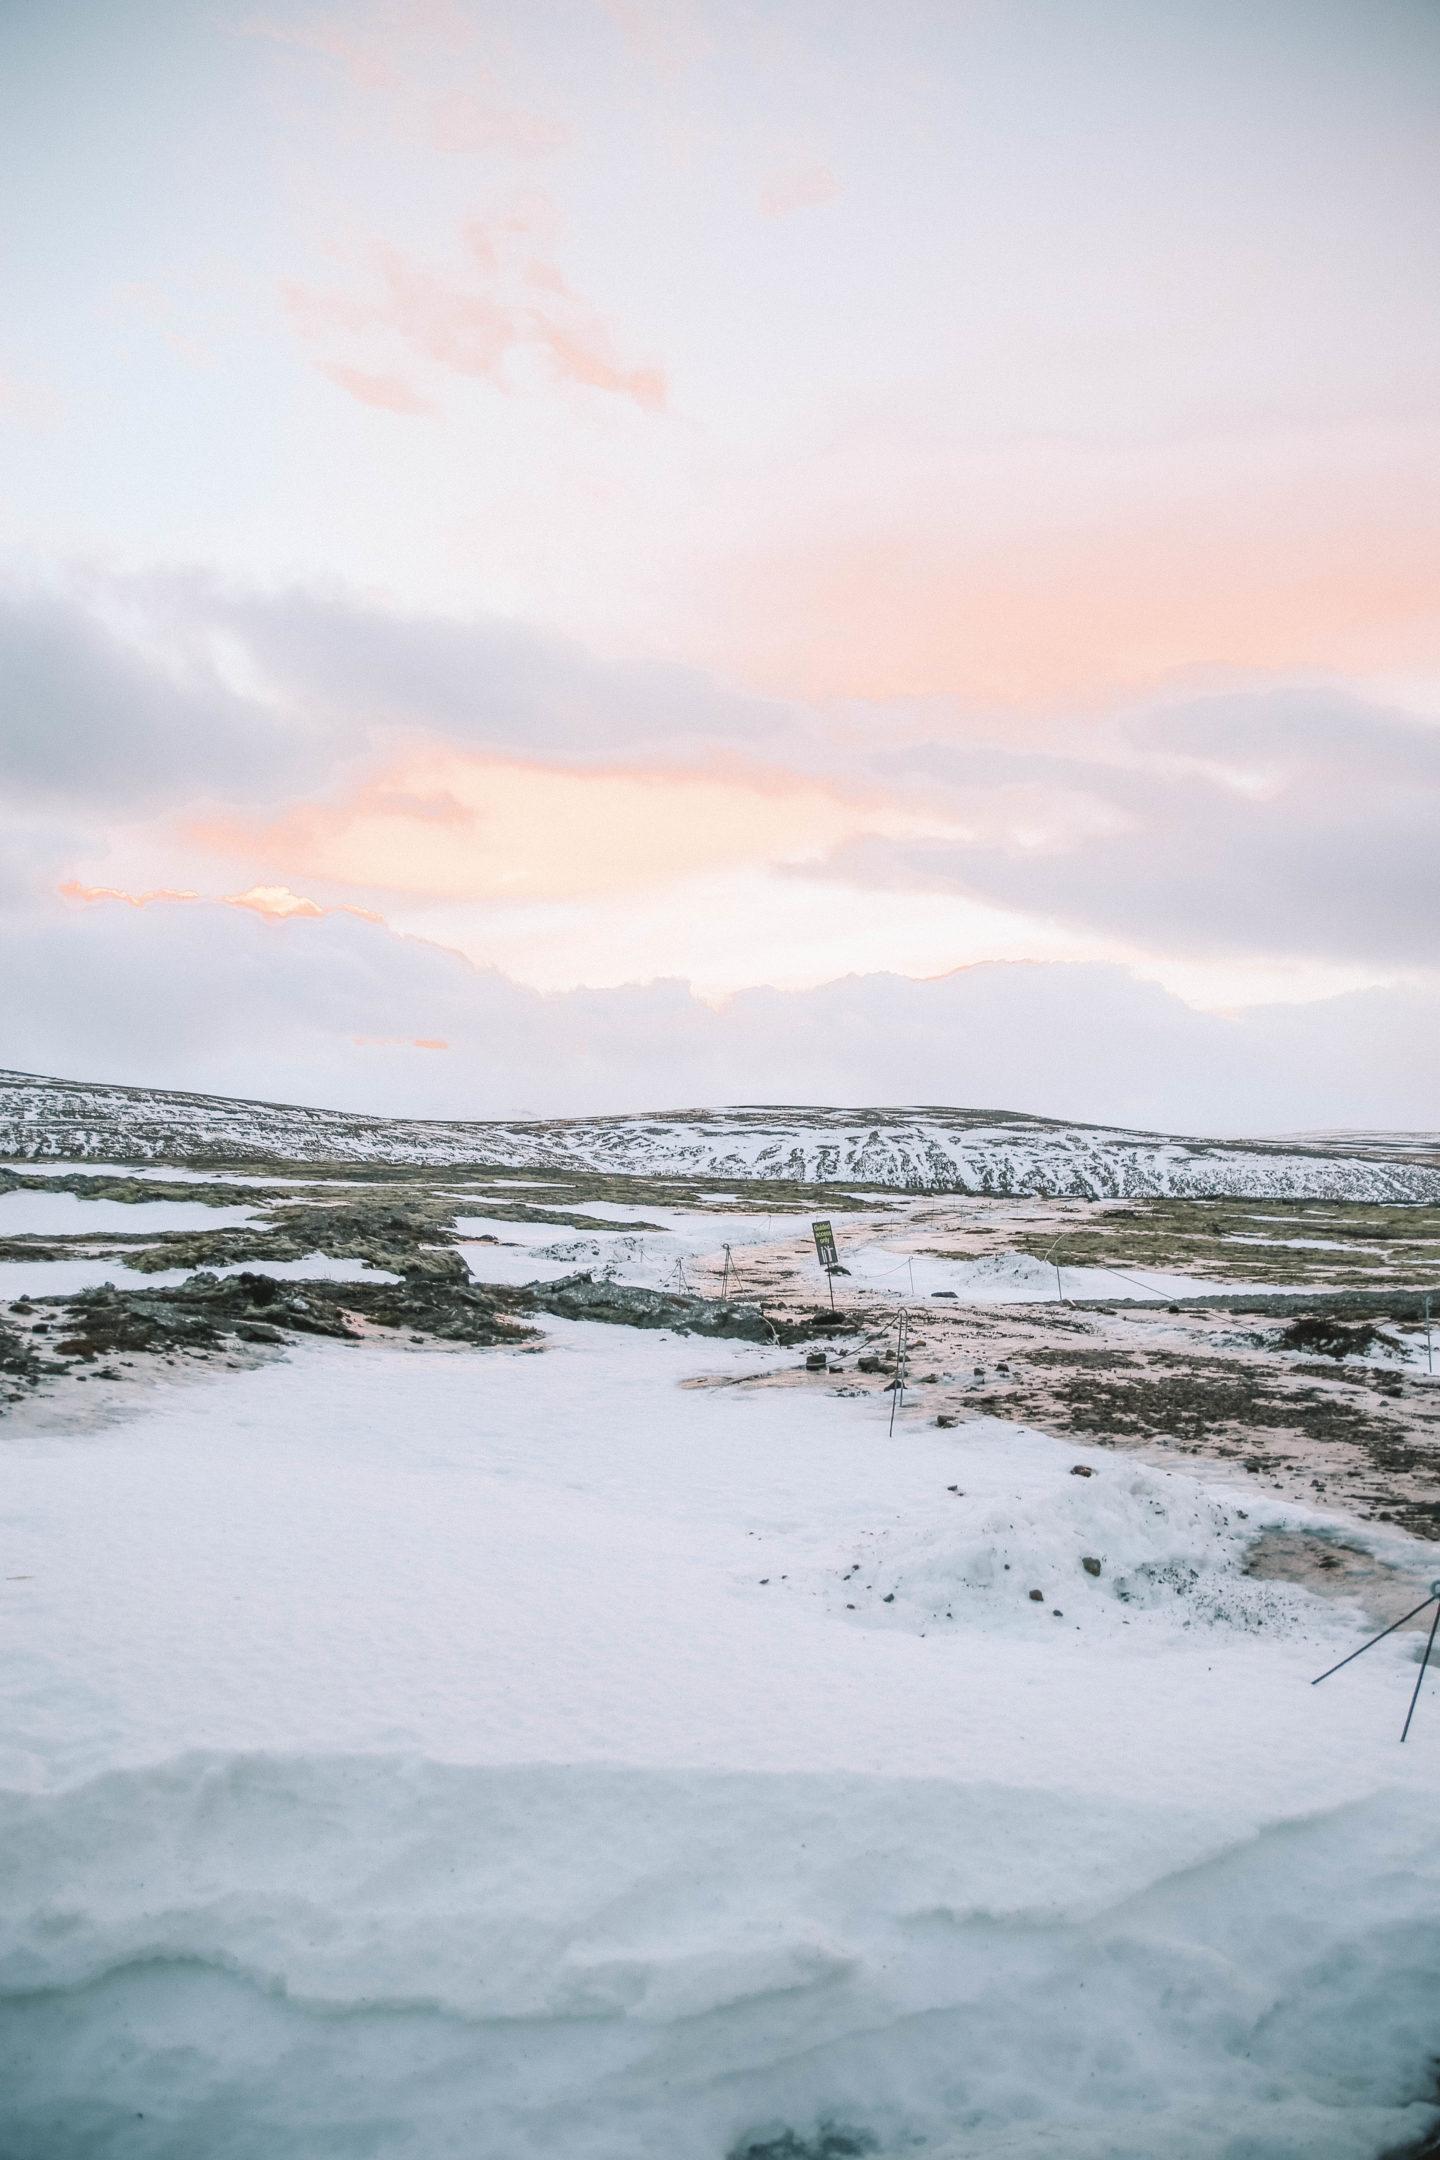 Las Cavas Islande - Blondie Baby blog mode et voyages